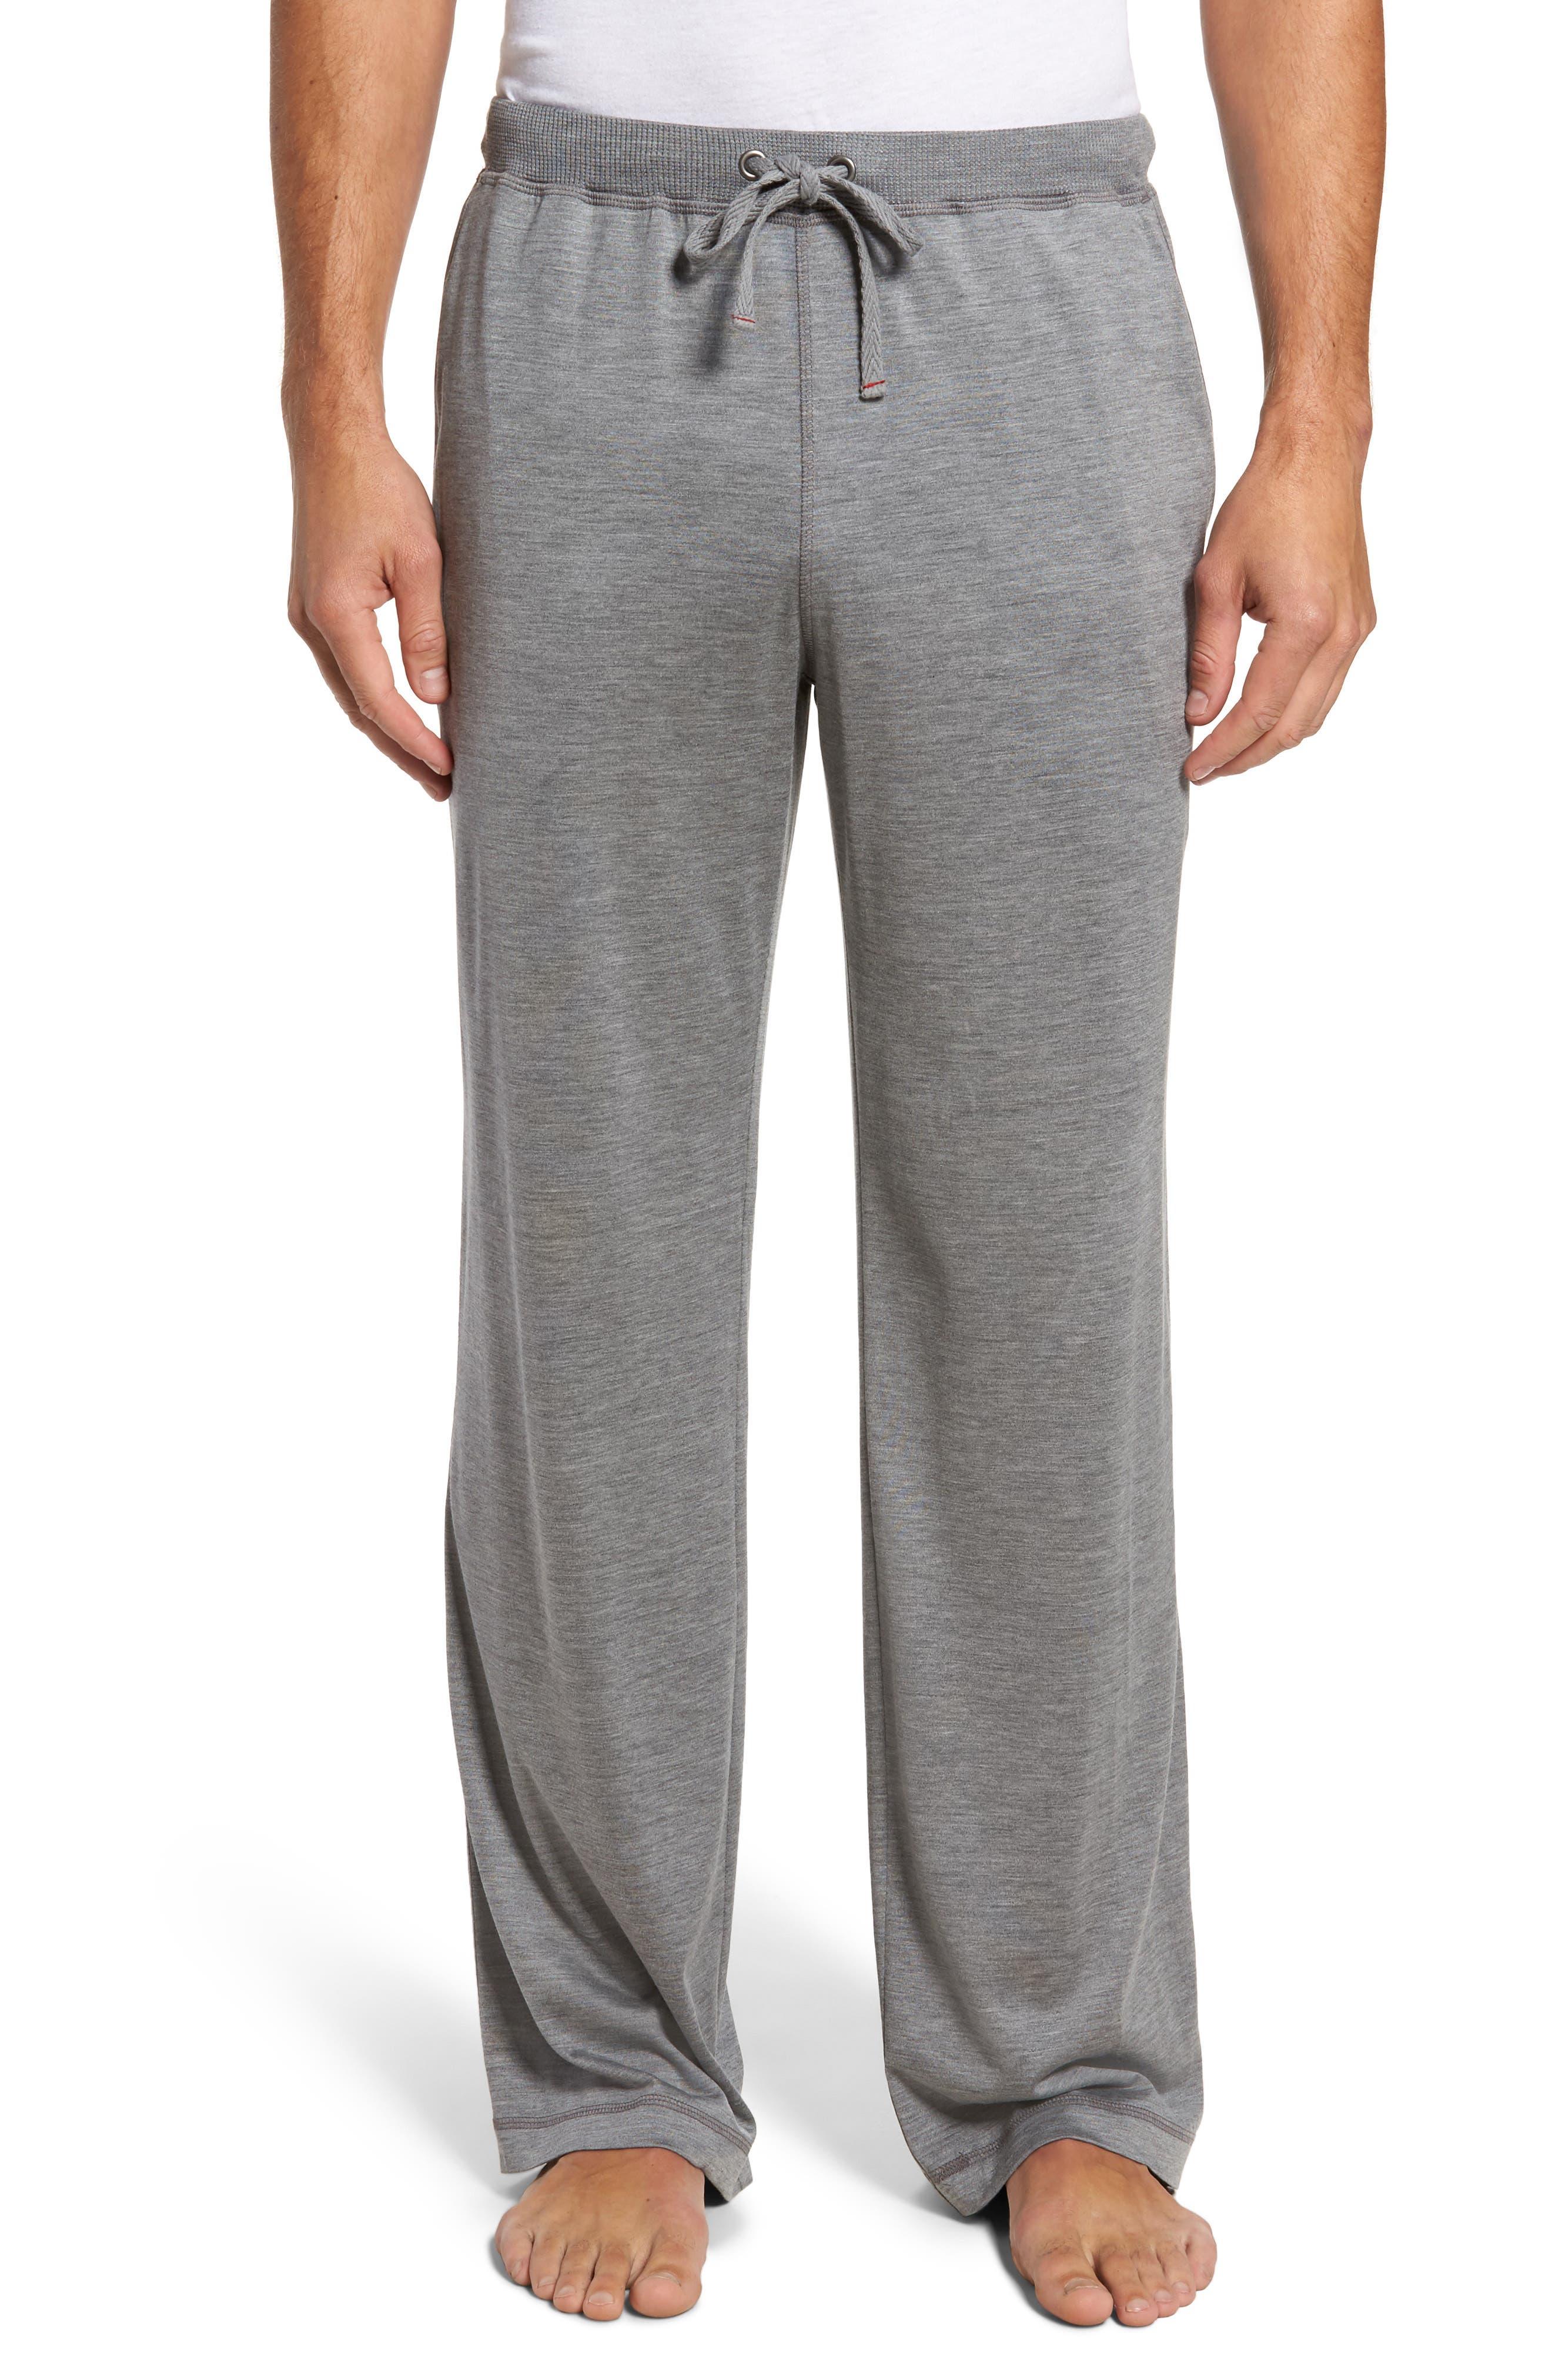 Silk & Cotton Lounge Pants,                         Main,                         color, CHARCOAL HEATHER